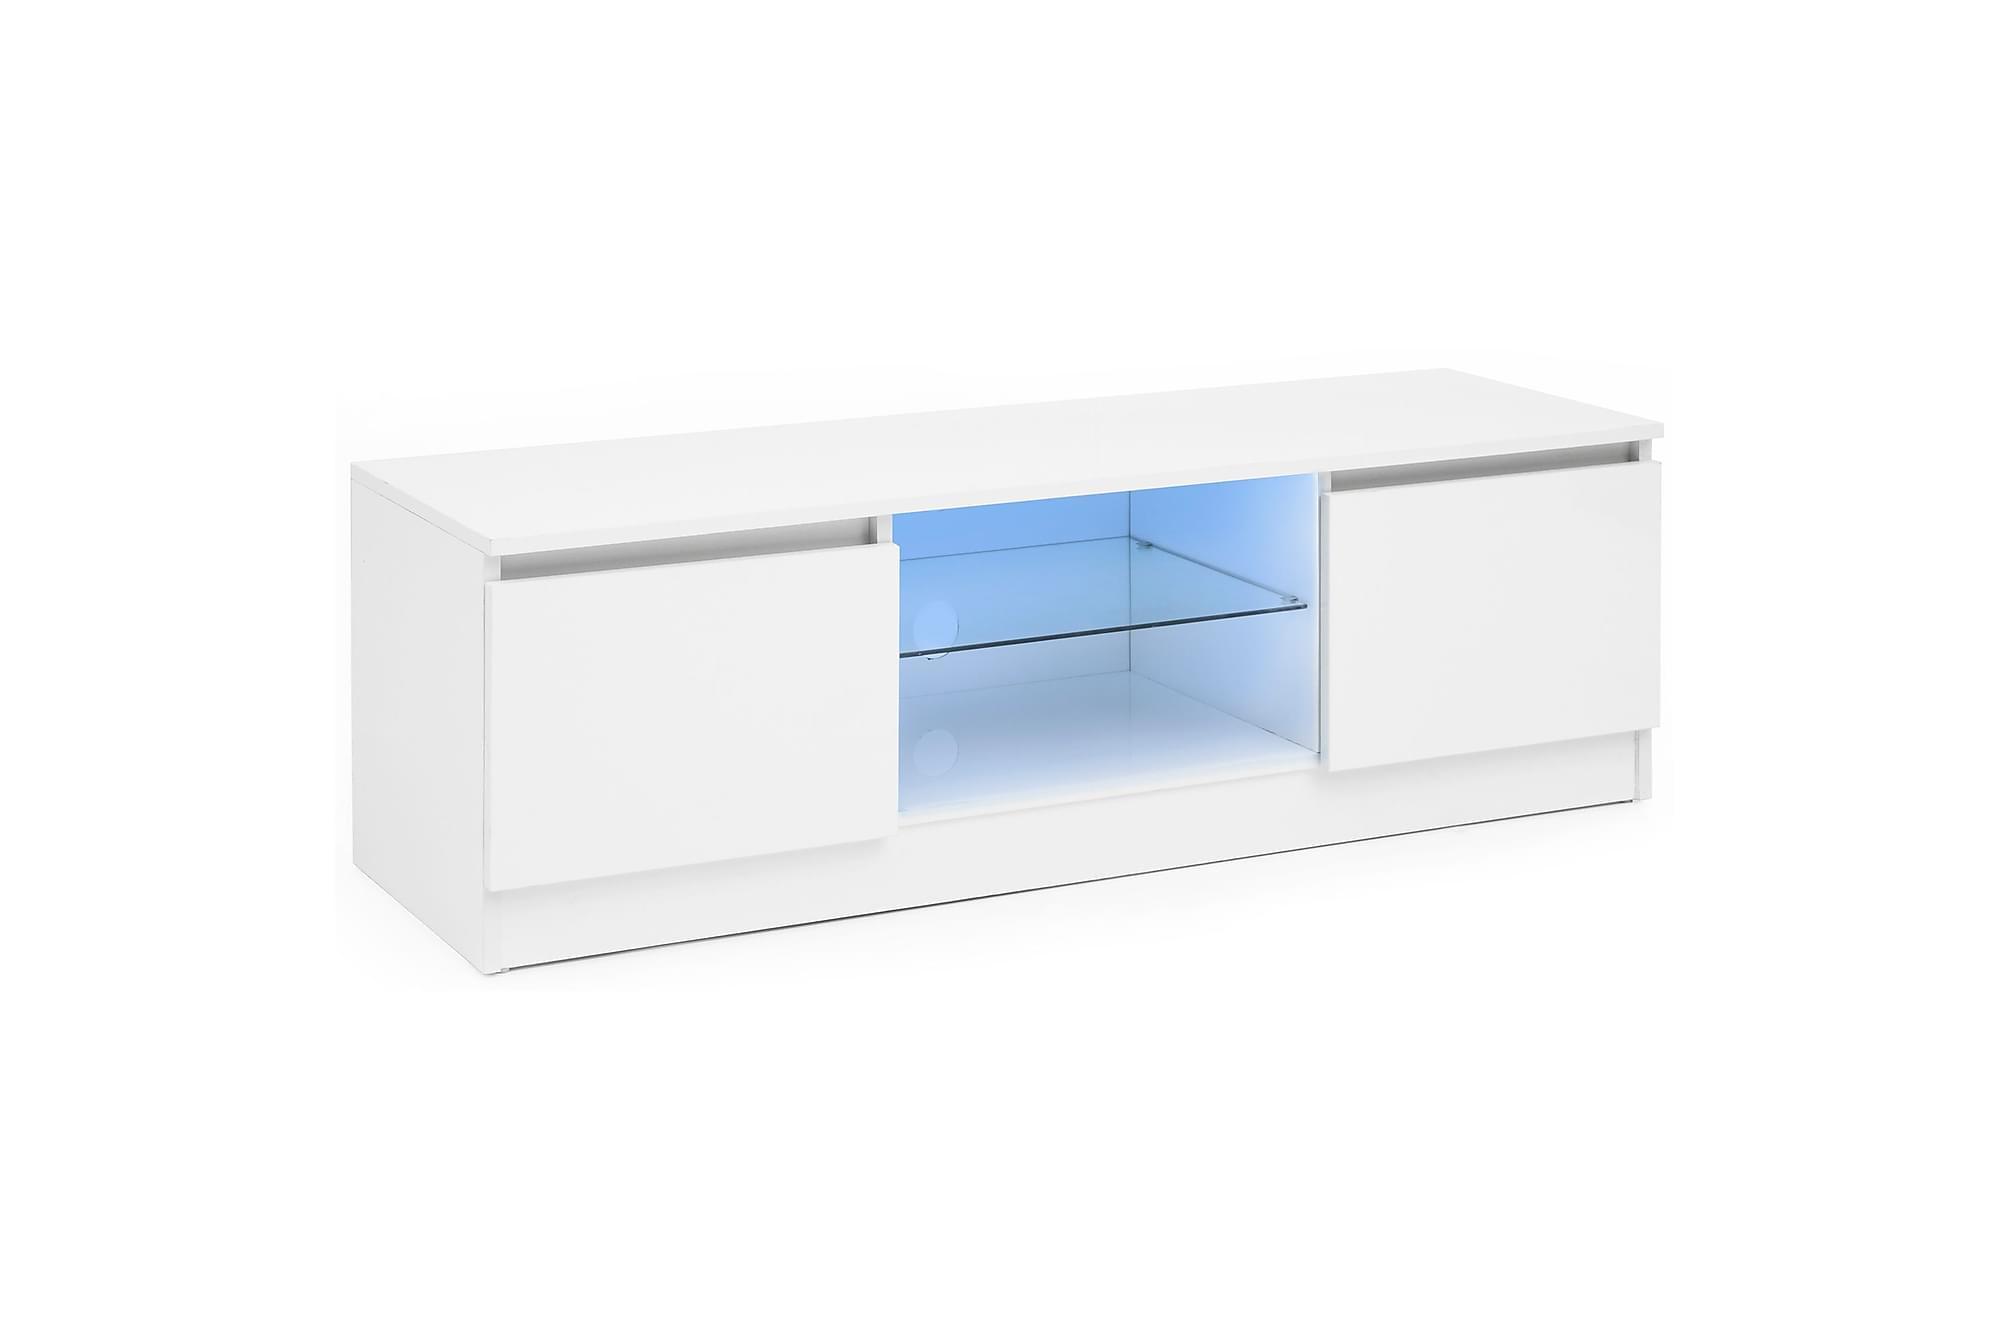 Reidler tv-bänk 120 cm vit